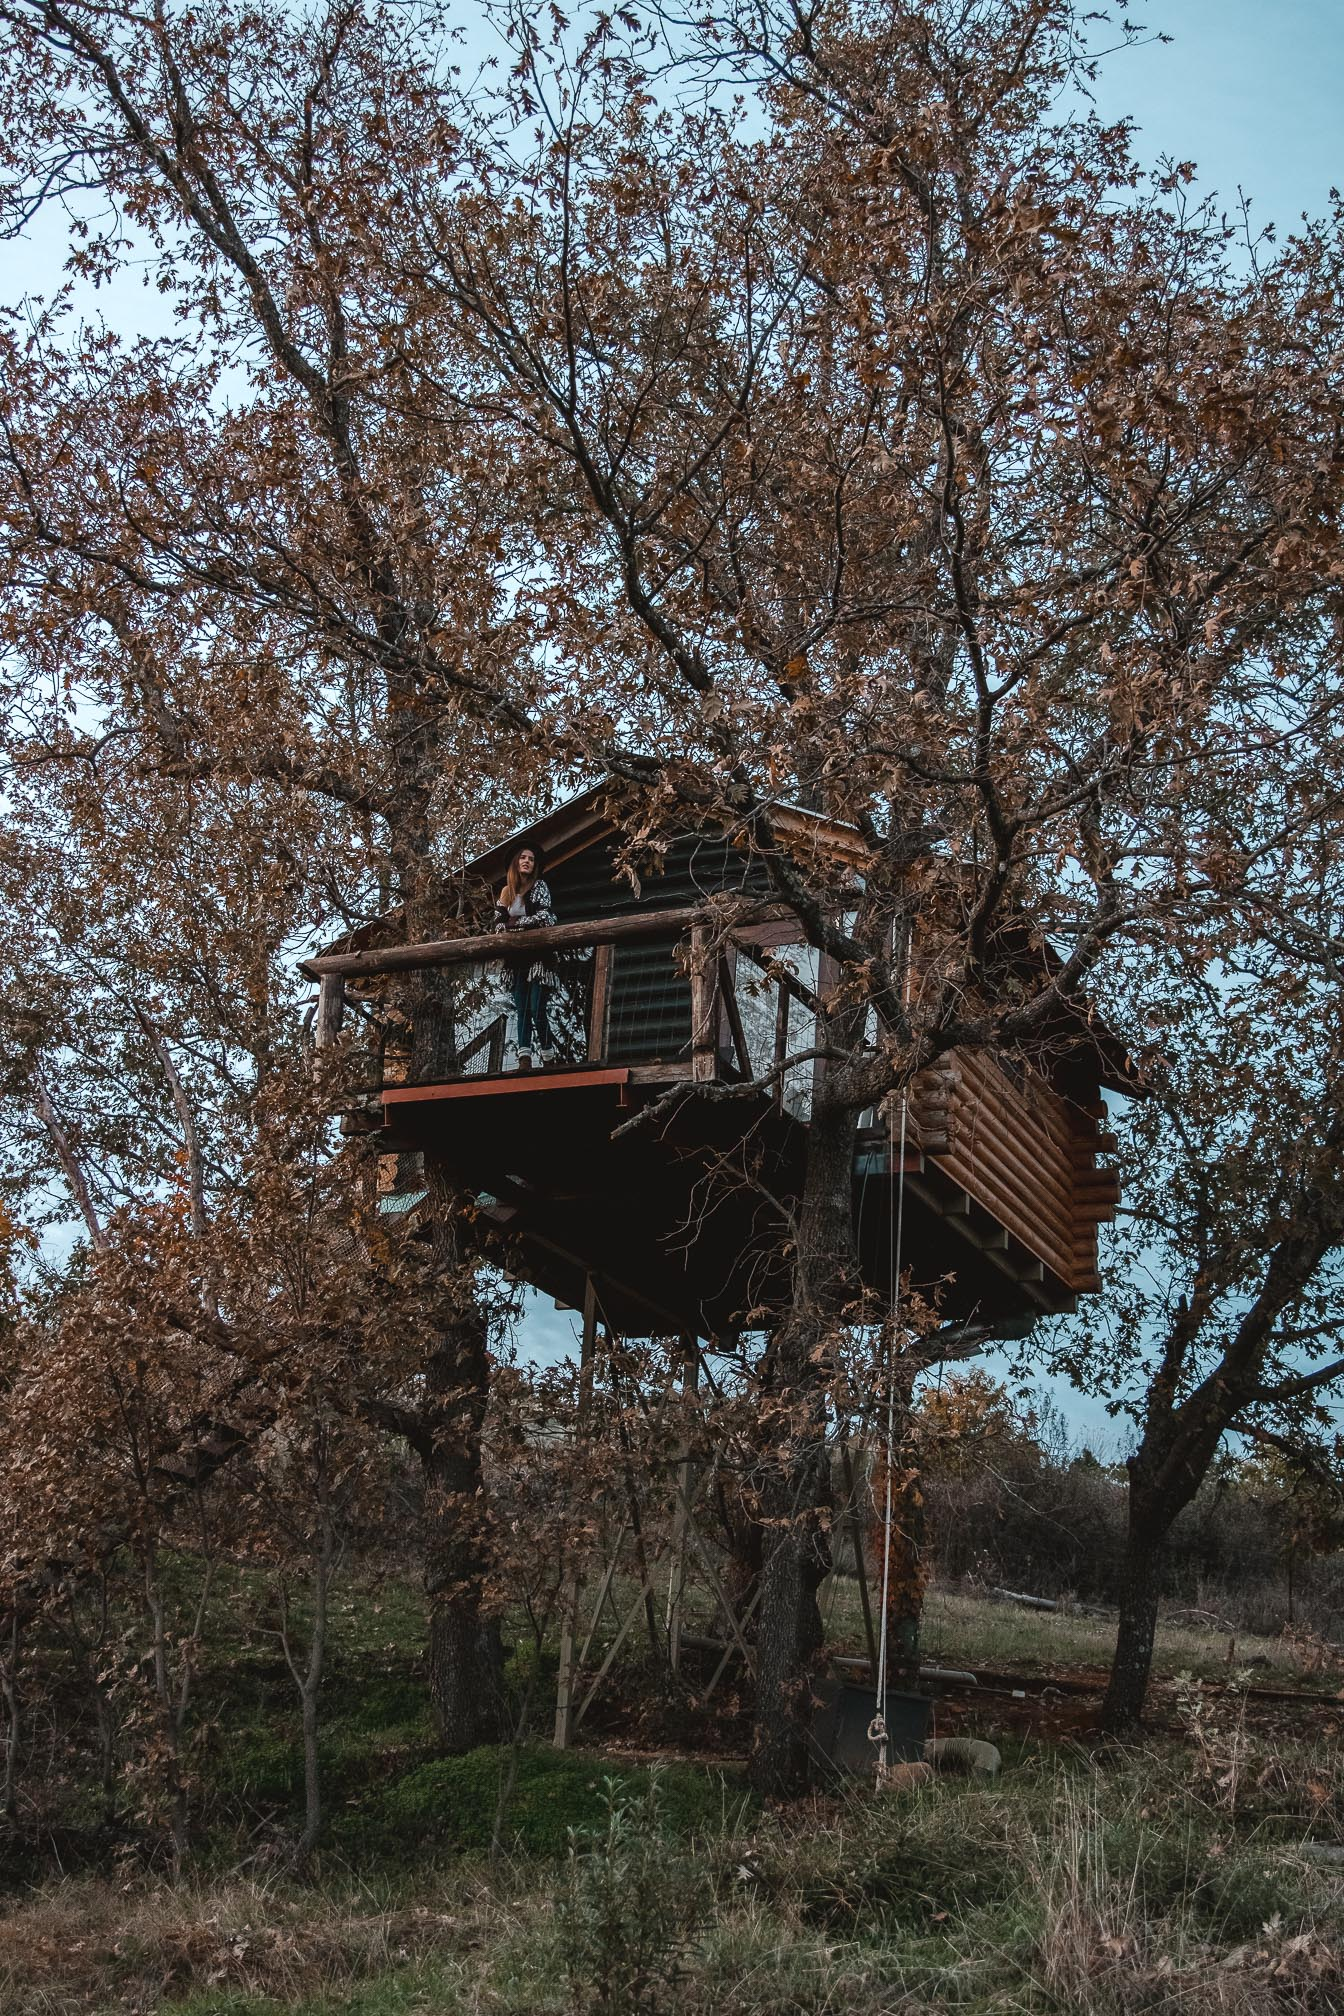 cabaña arbol hotel extremadura